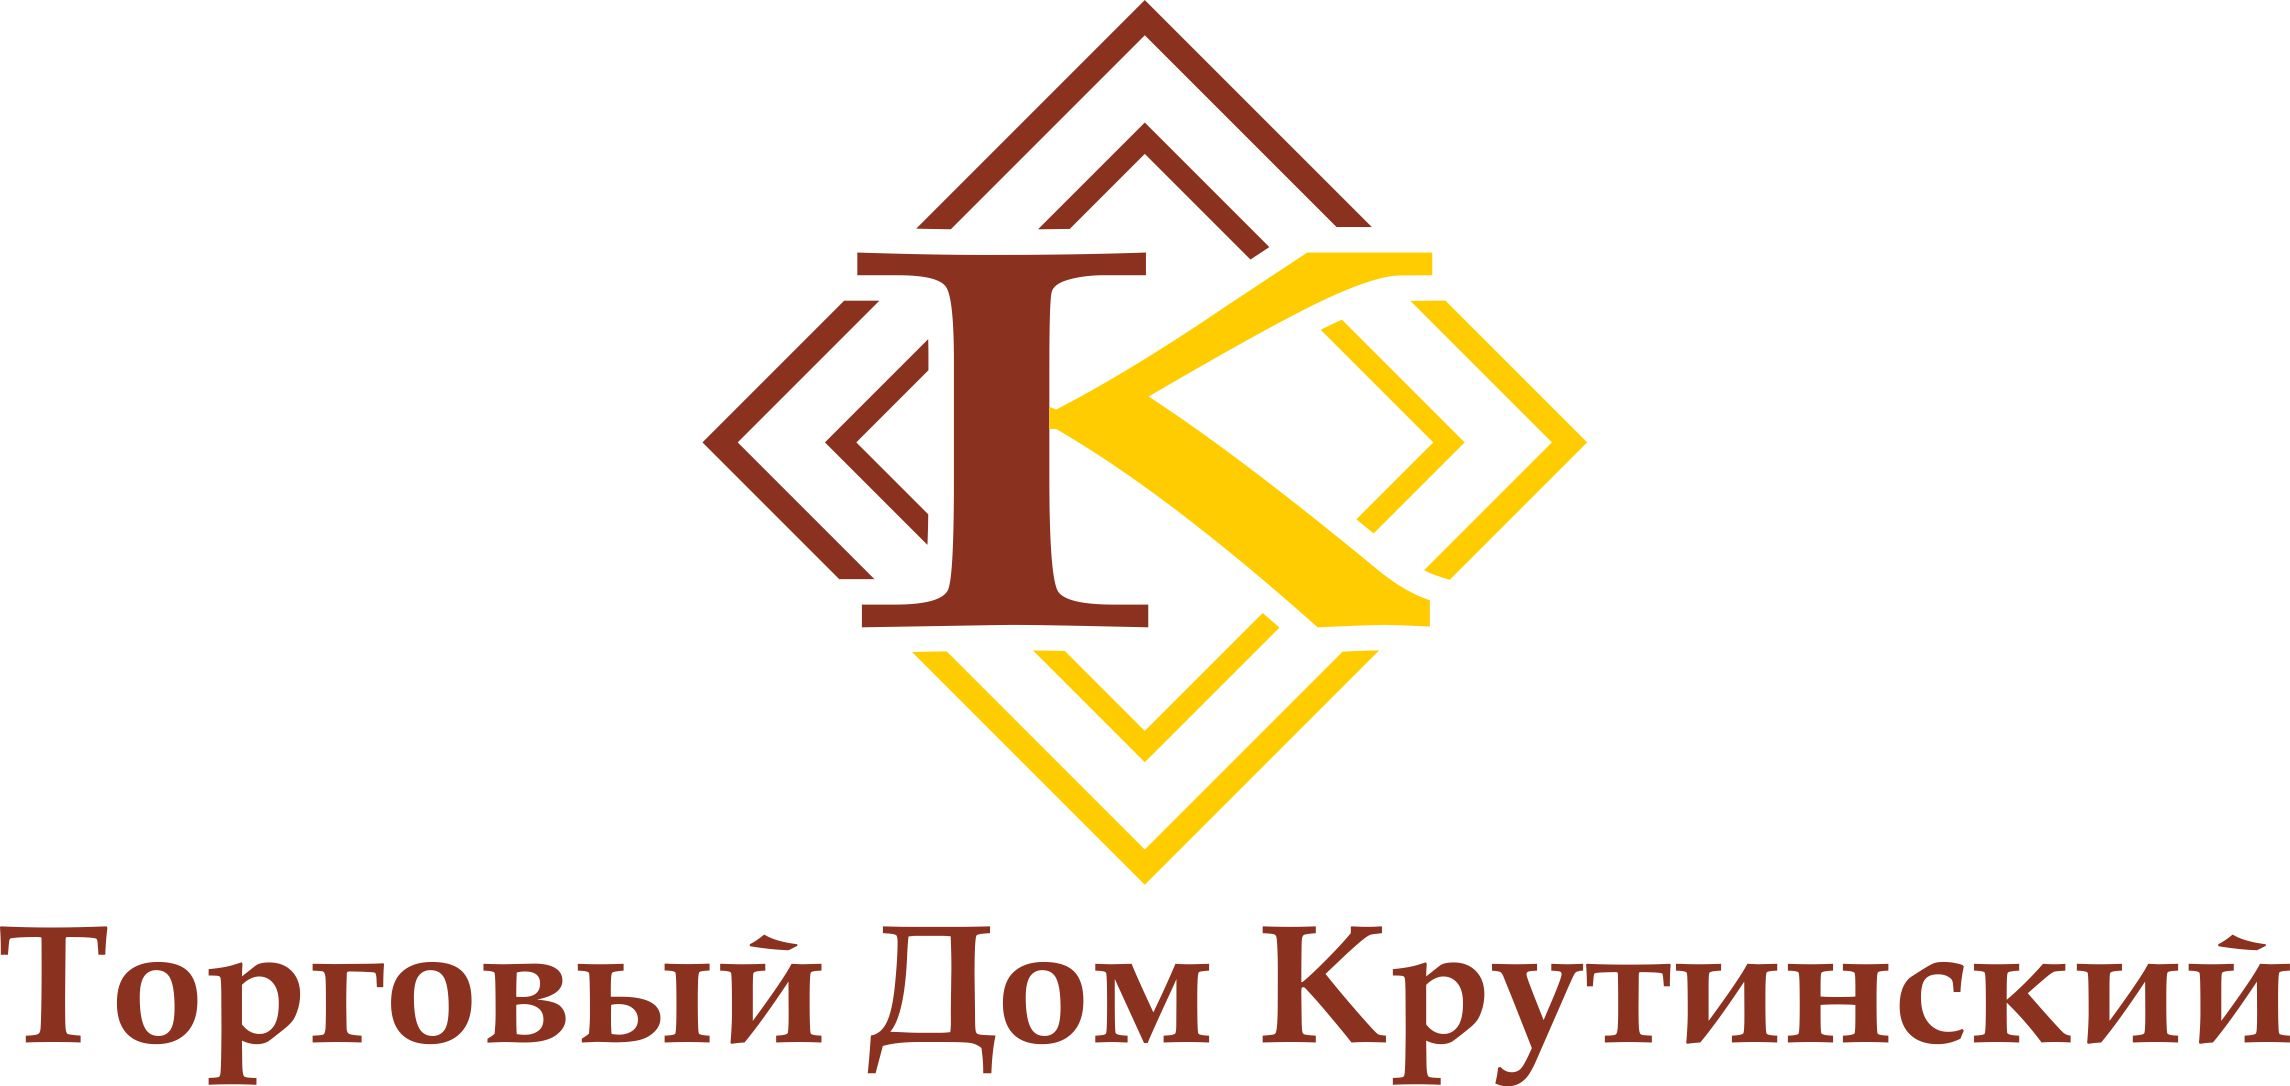 Логотип для камнедобывающей компании фото f_5185b9a038f3a8b9.jpg